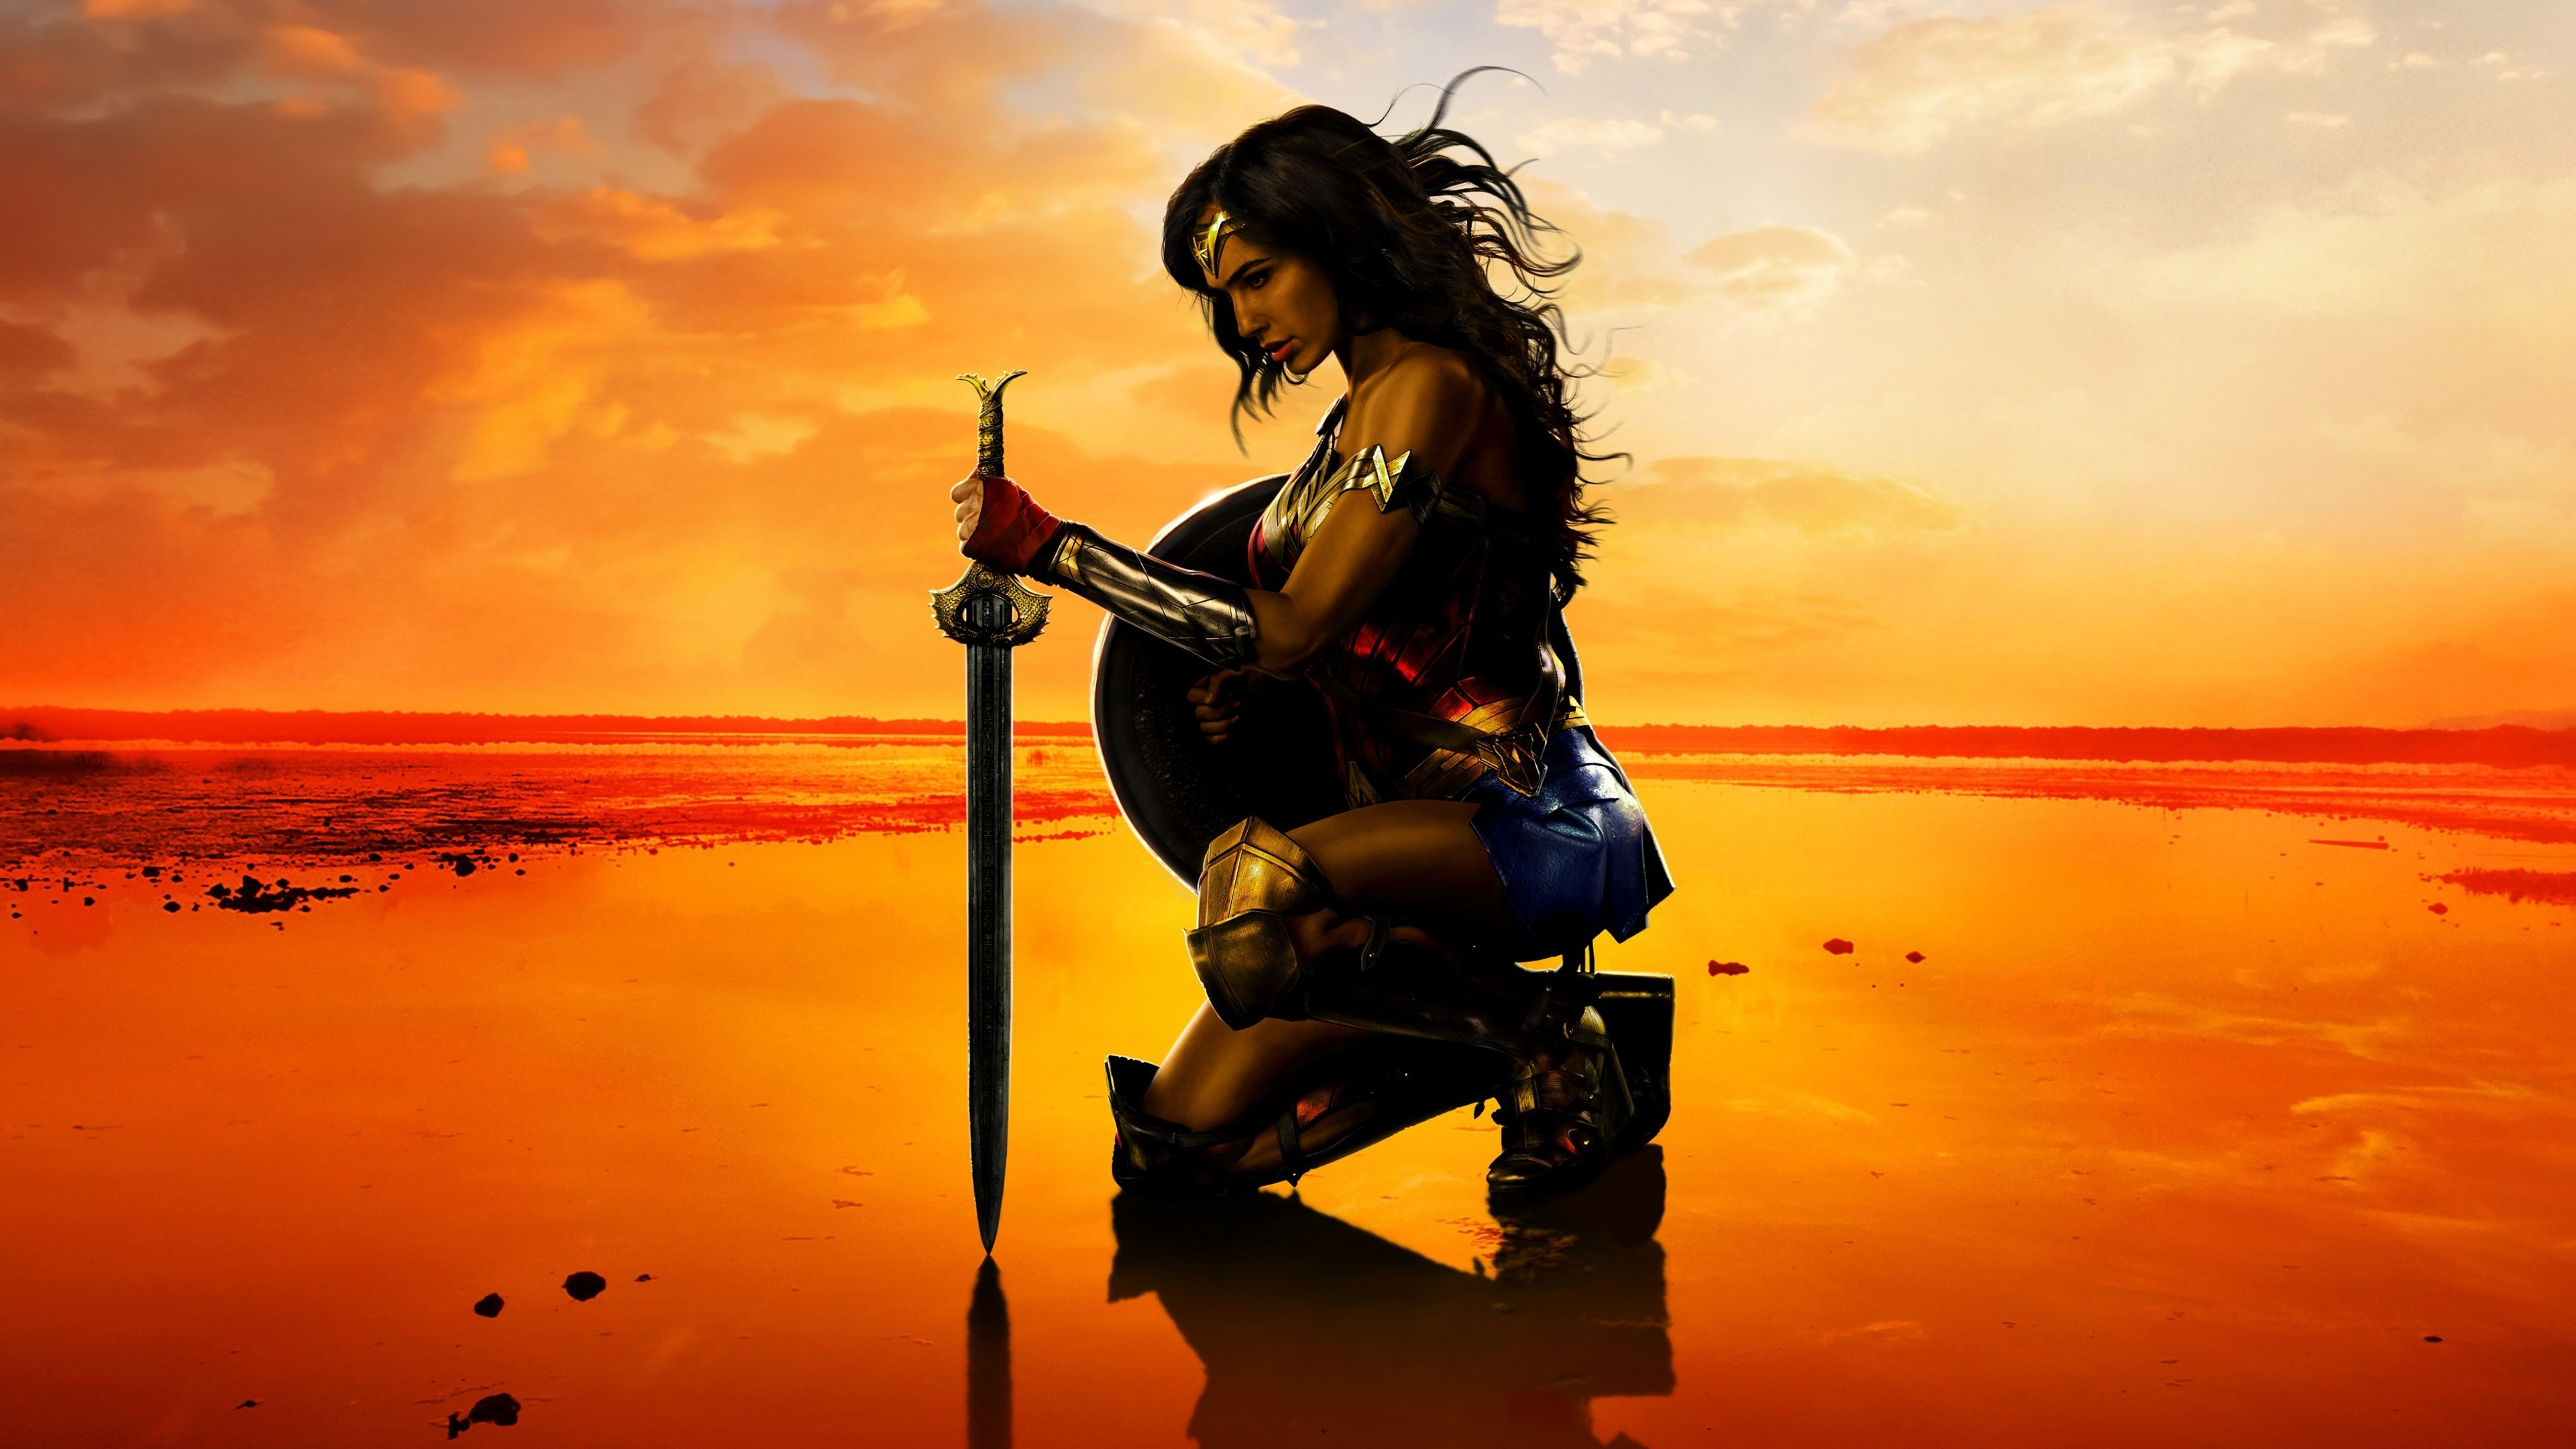 wonder woman movie gal gadot hd wallpaper | 1080p wallpaper